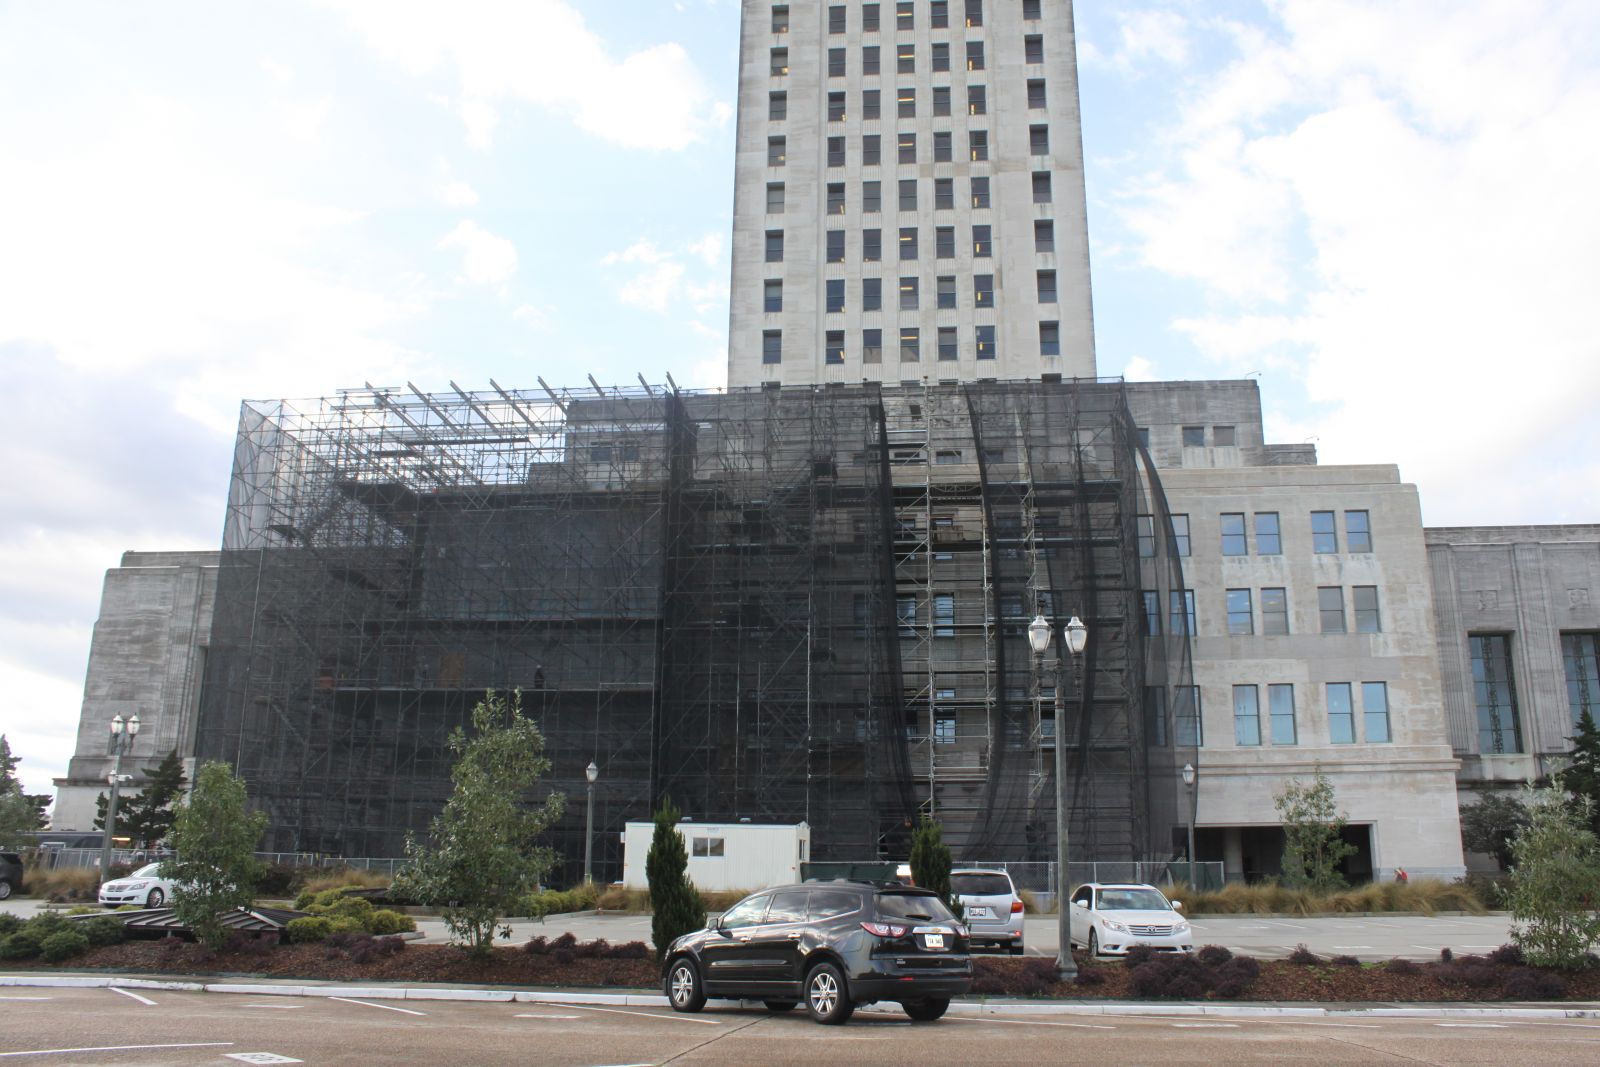 LA State Capital Building Improvements